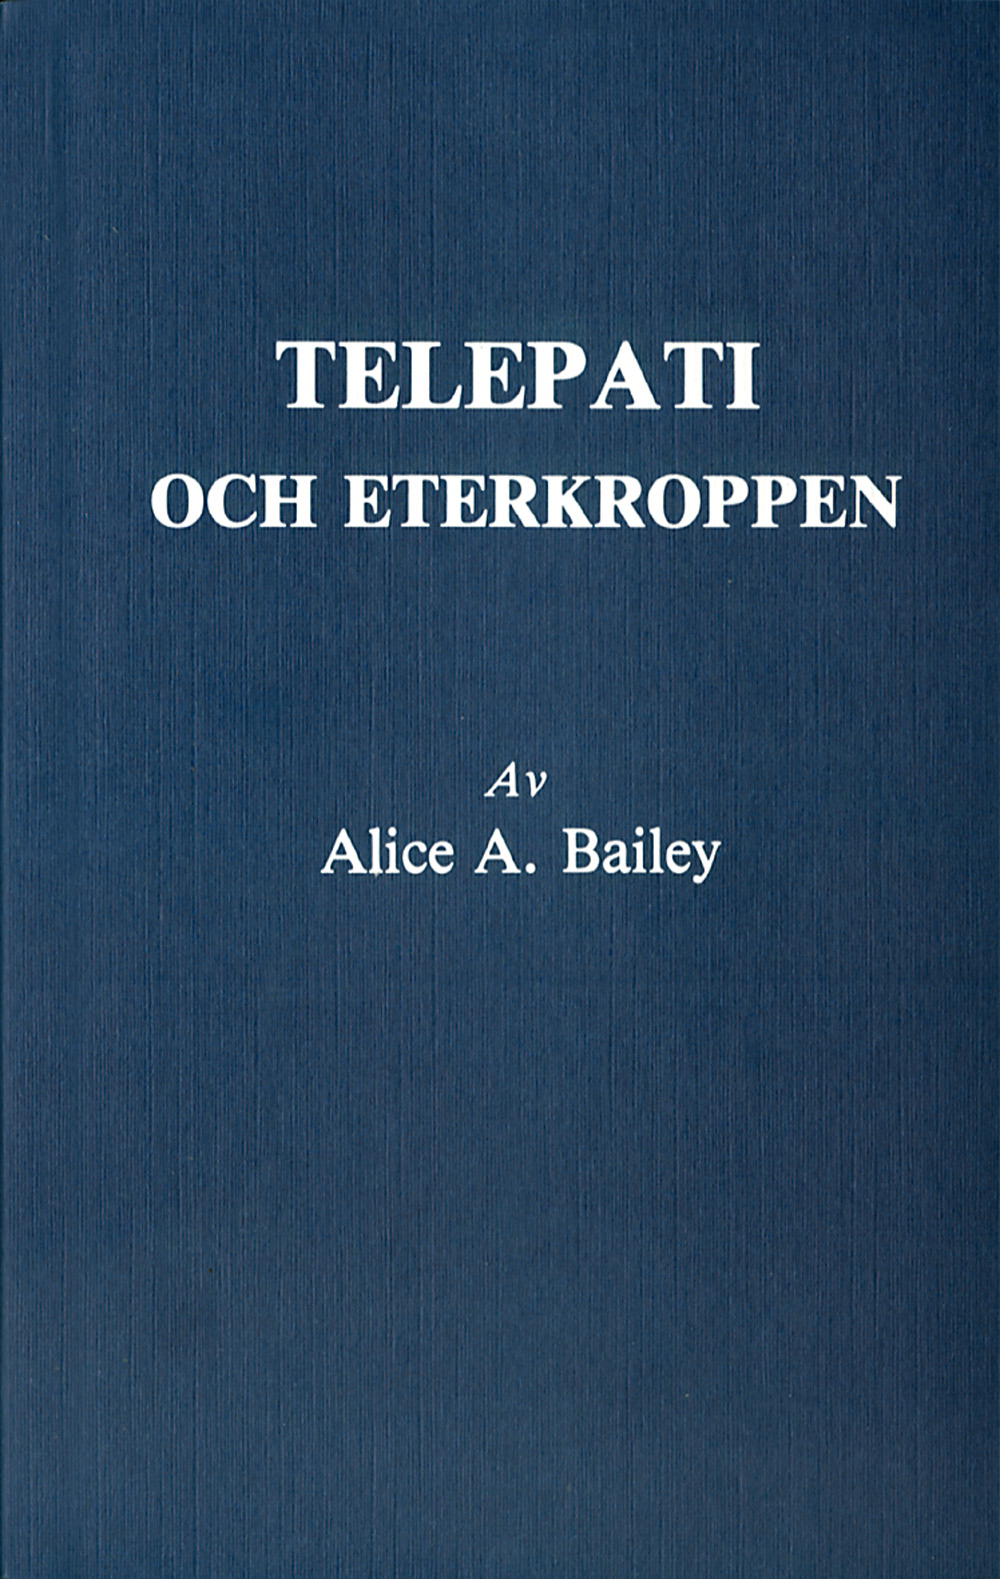 Telepati och eterkroppen (2u) av Alice A Bailey